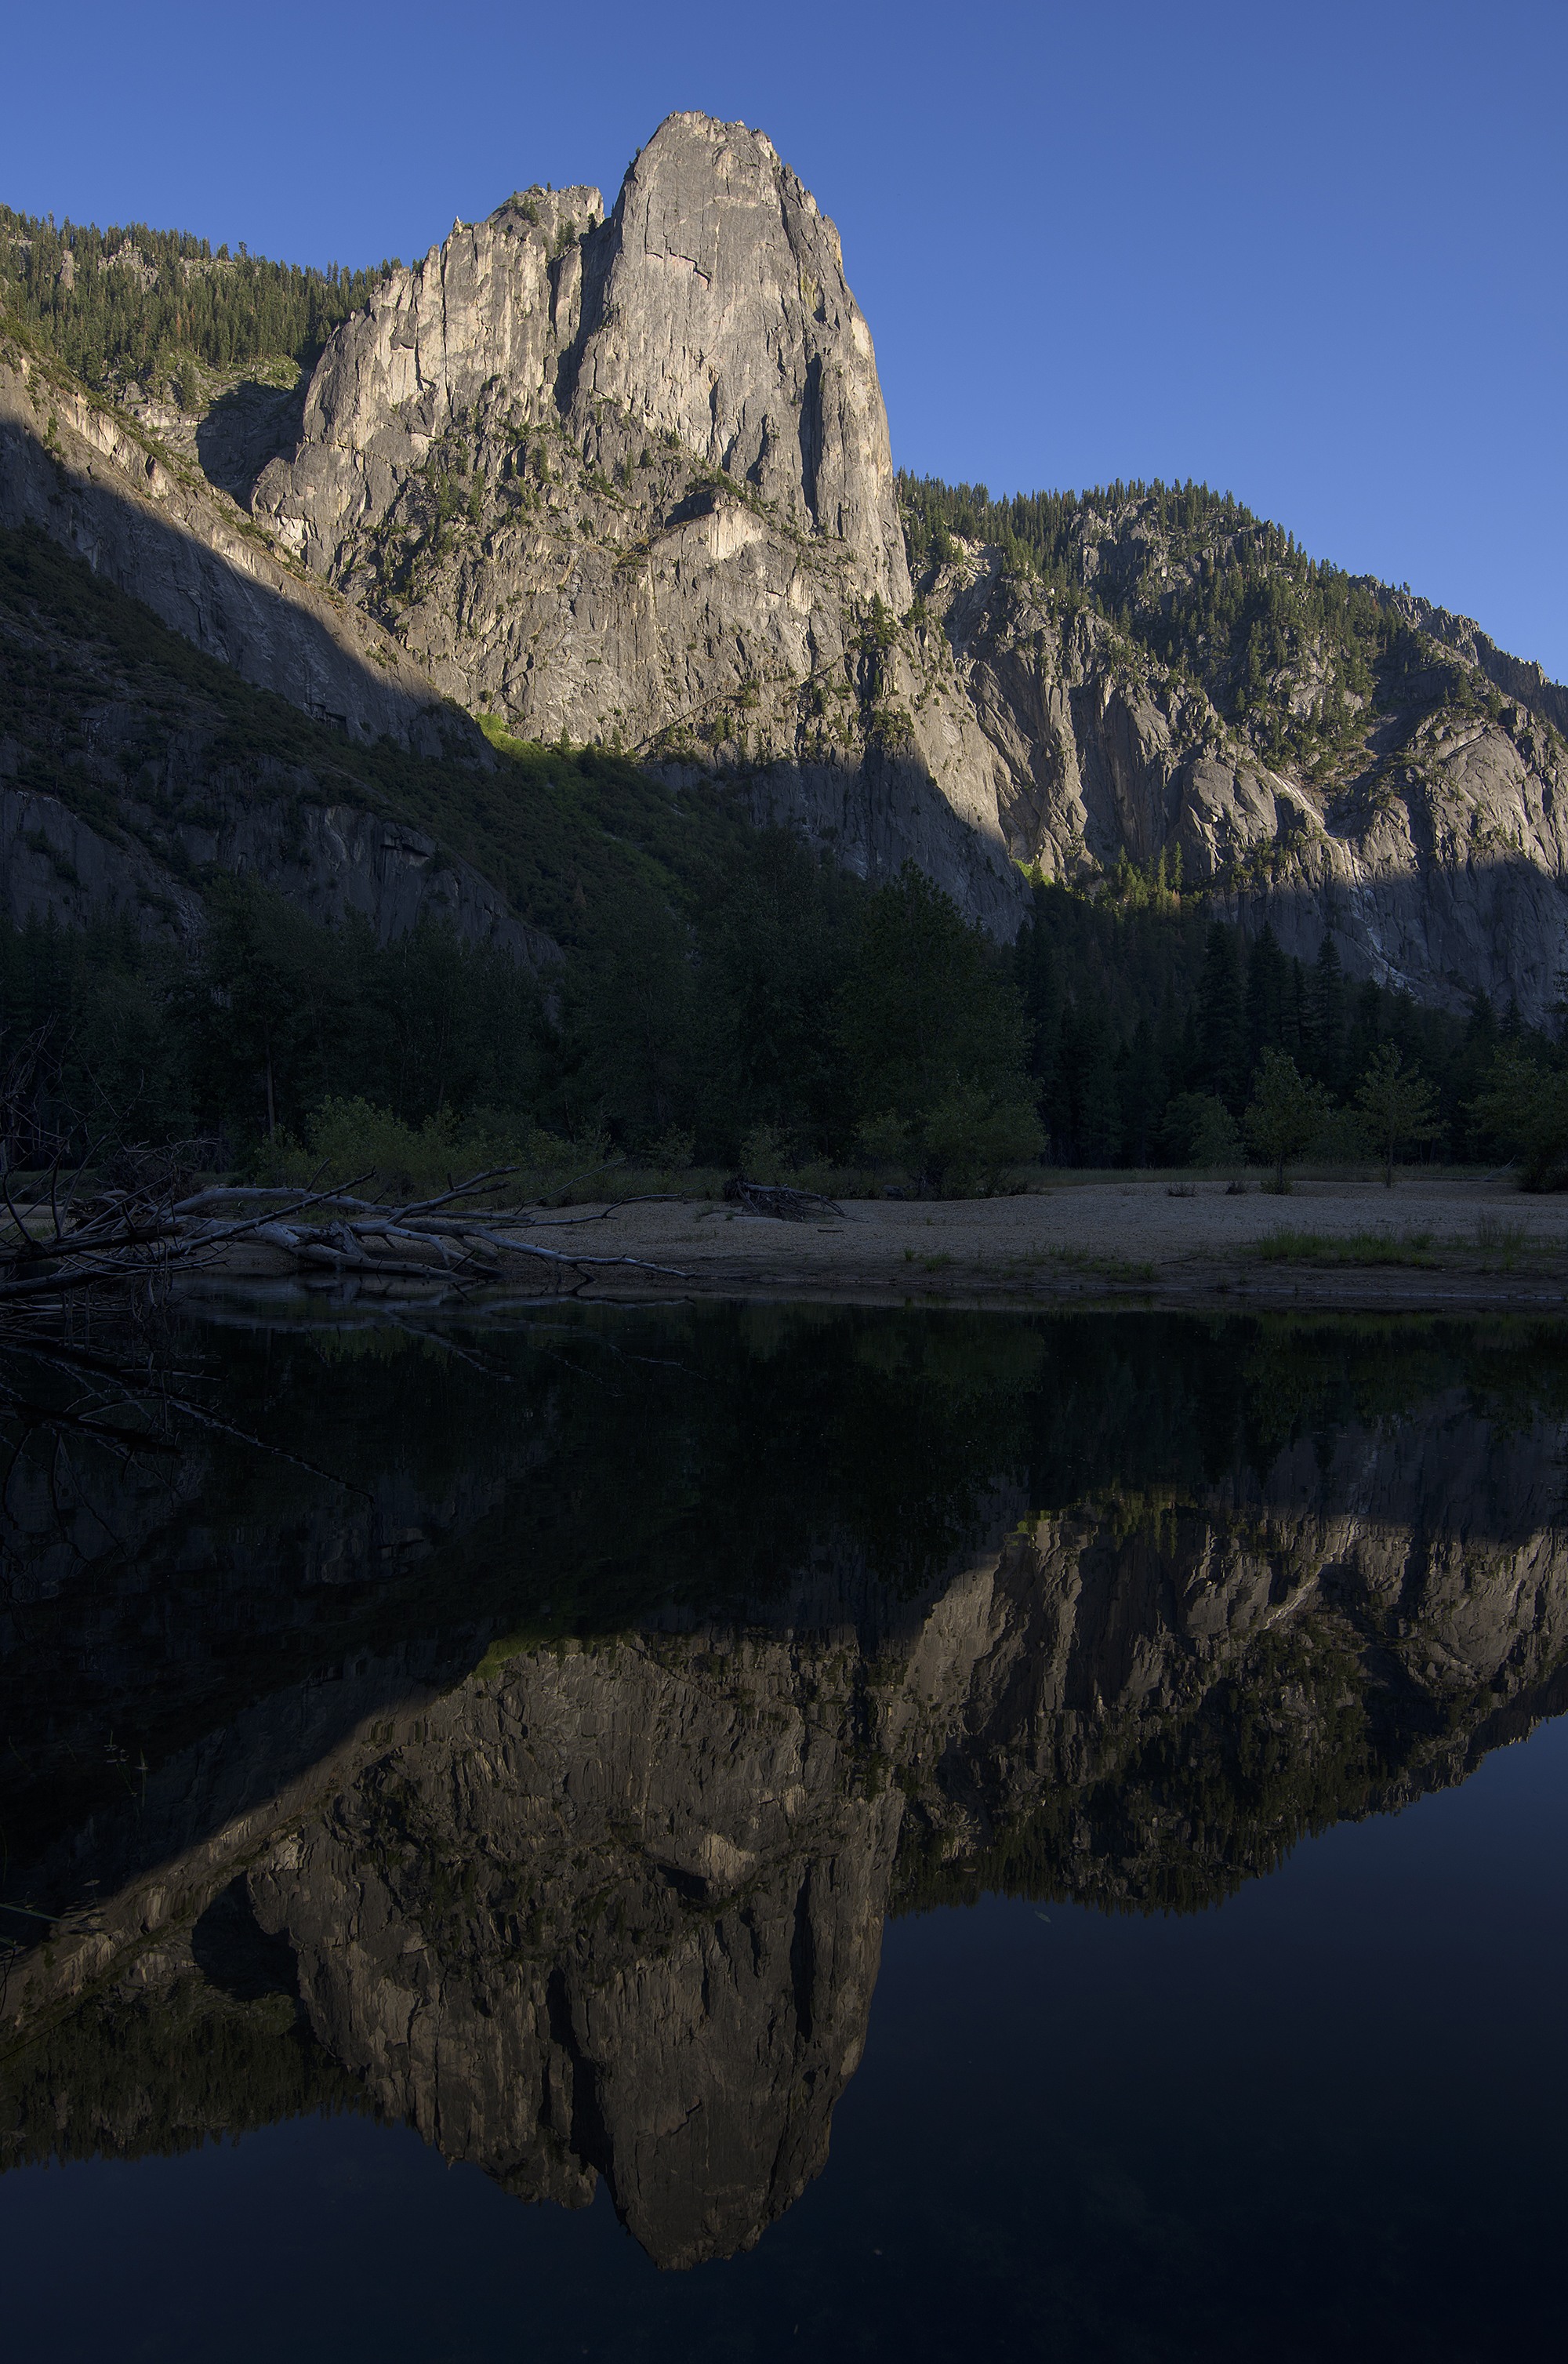 Yosemite National Park © Robert Lowdon